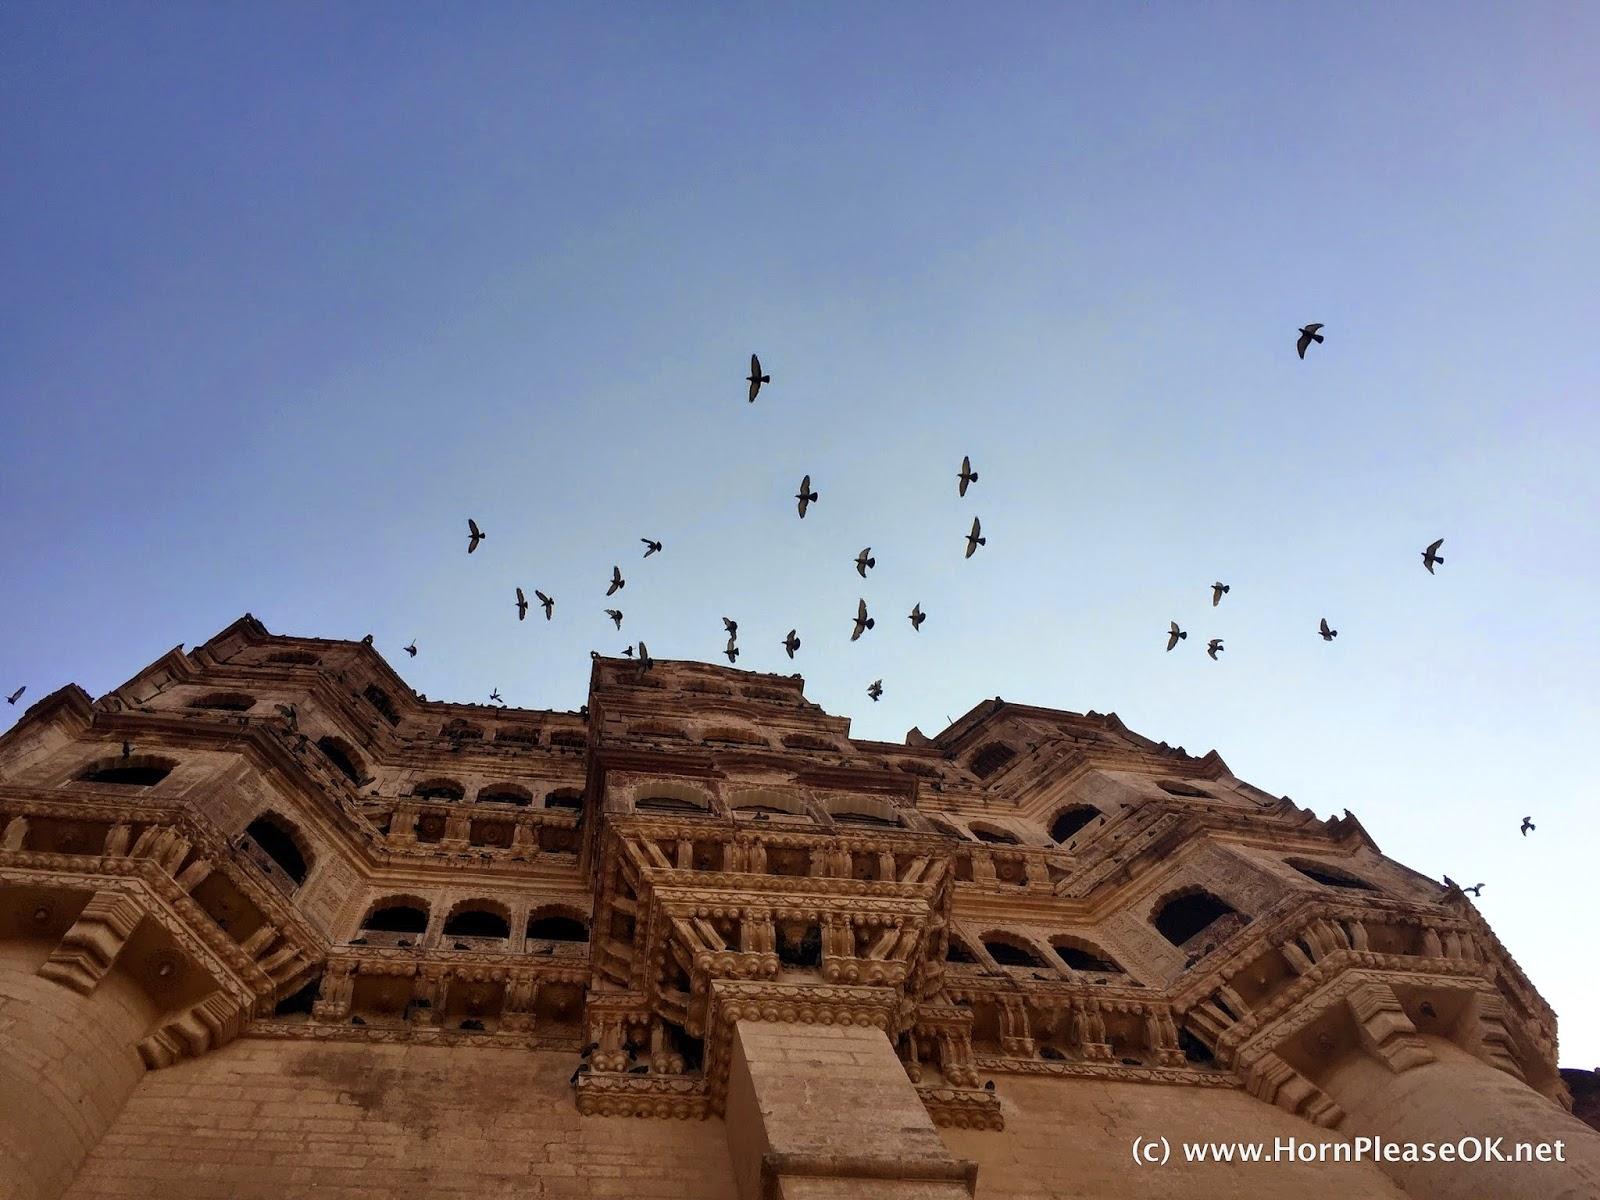 Pigeons take flight from the windows of Mehrangarh Fort